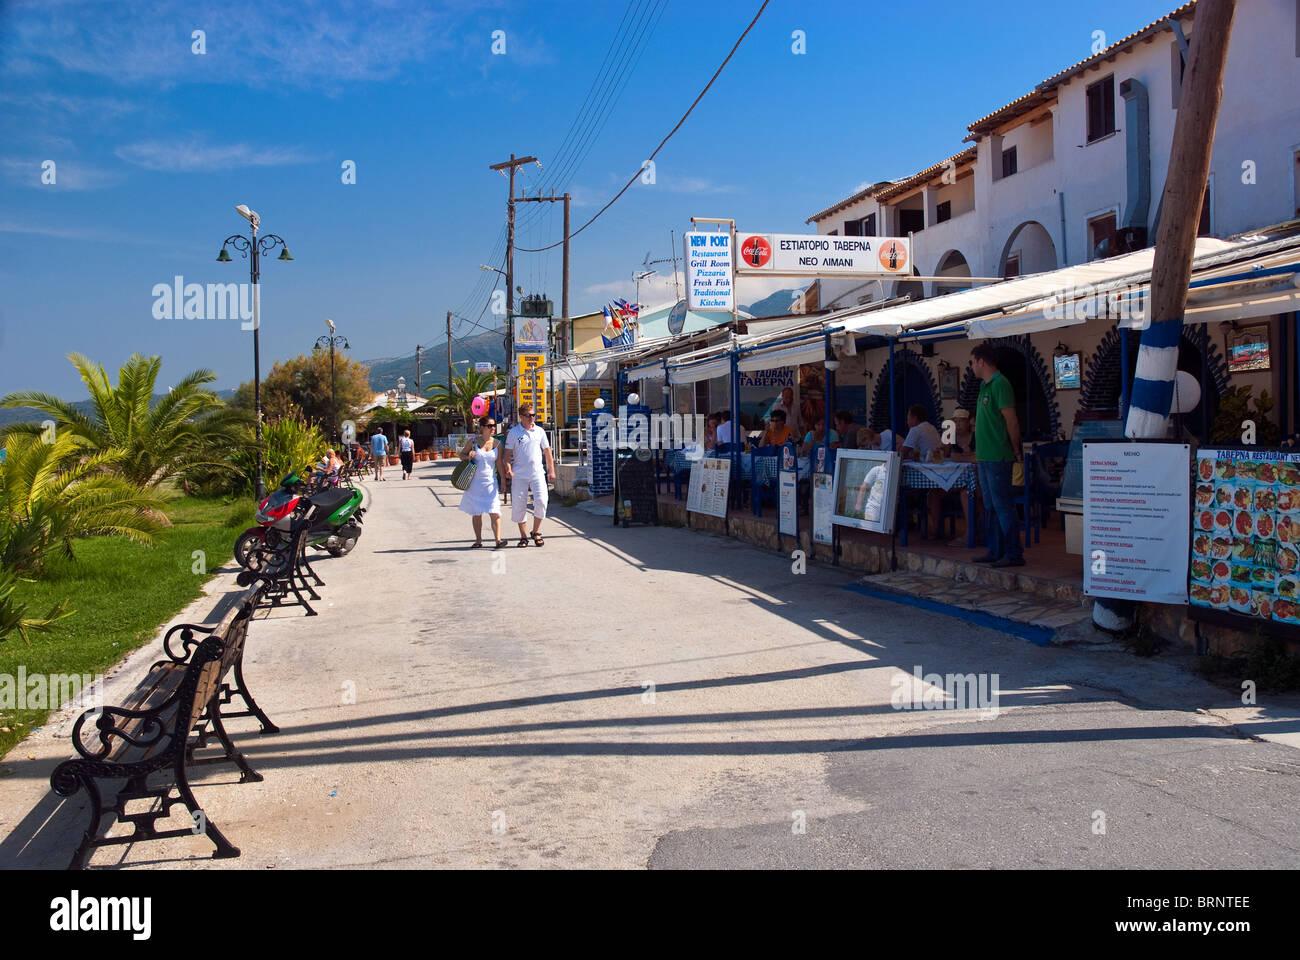 Roda Village, Corfu, Ionian Islands Greece. - Stock Image